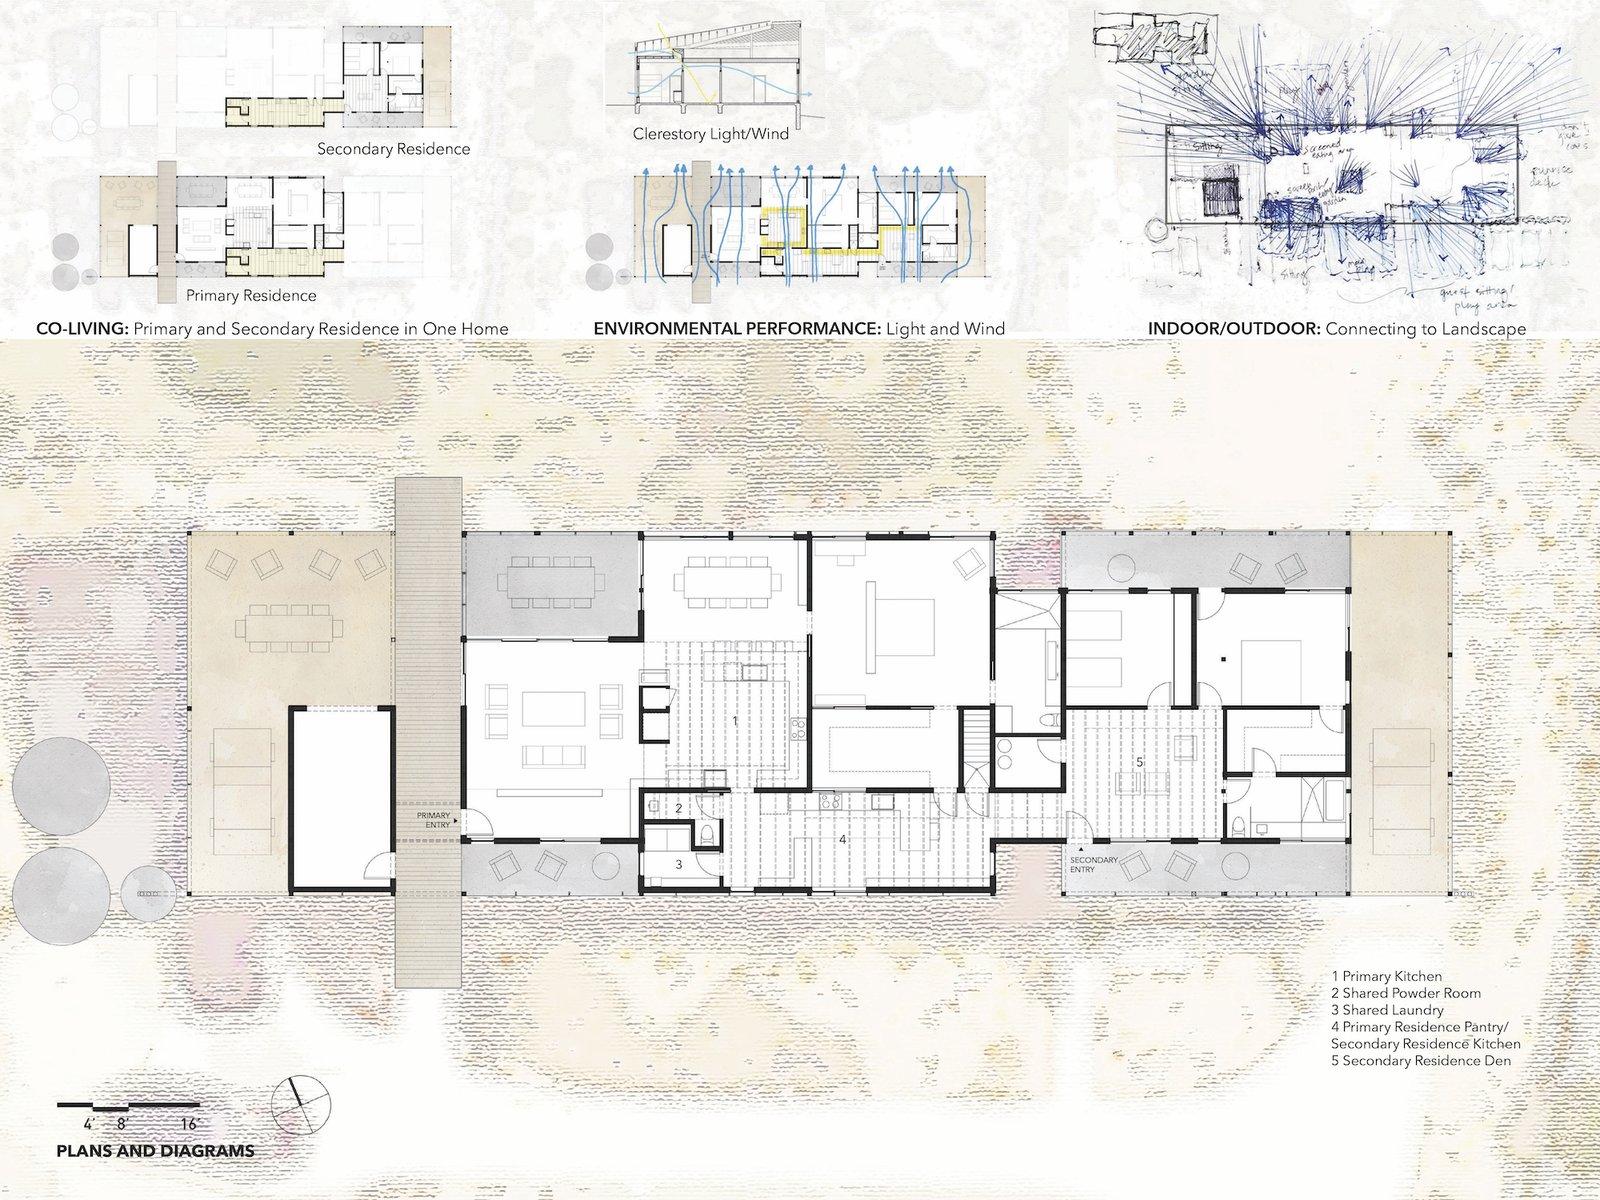 Floor plan of Dakota Mountain Residence by LowDO.